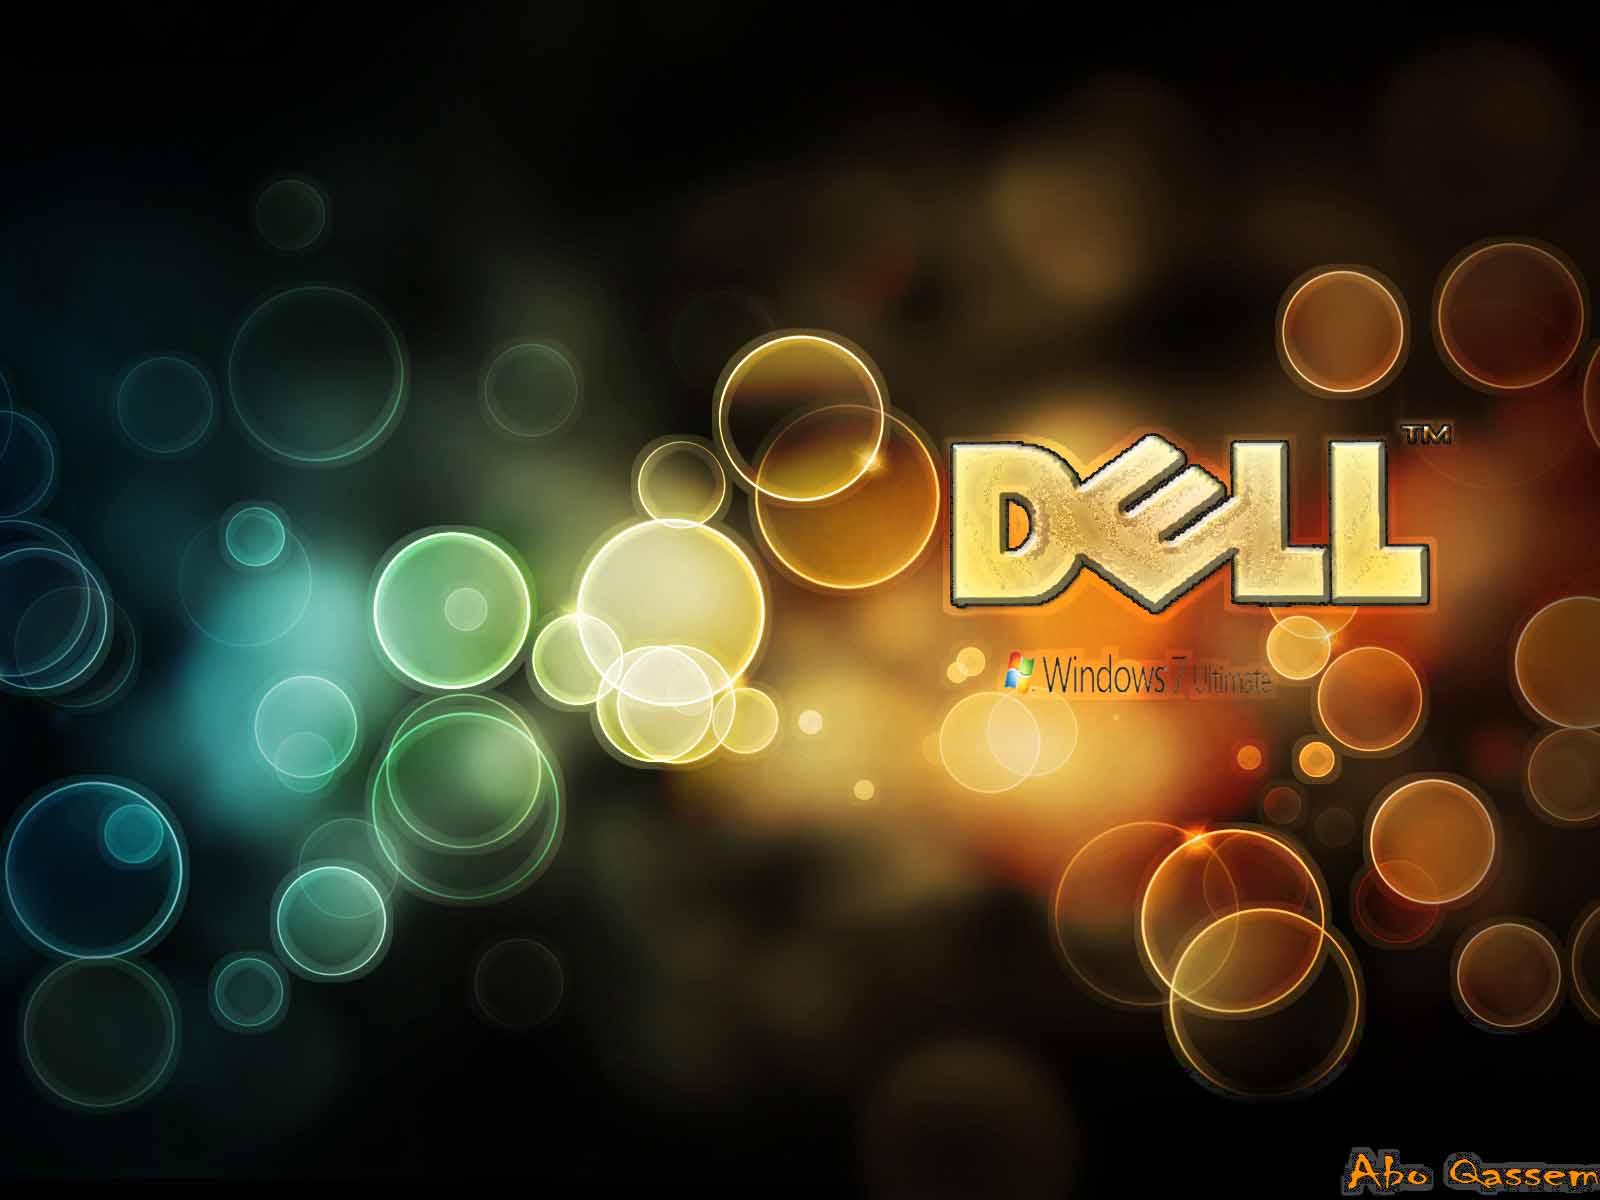 49+] Dell Laptop Wallpapers Download on WallpaperSafari